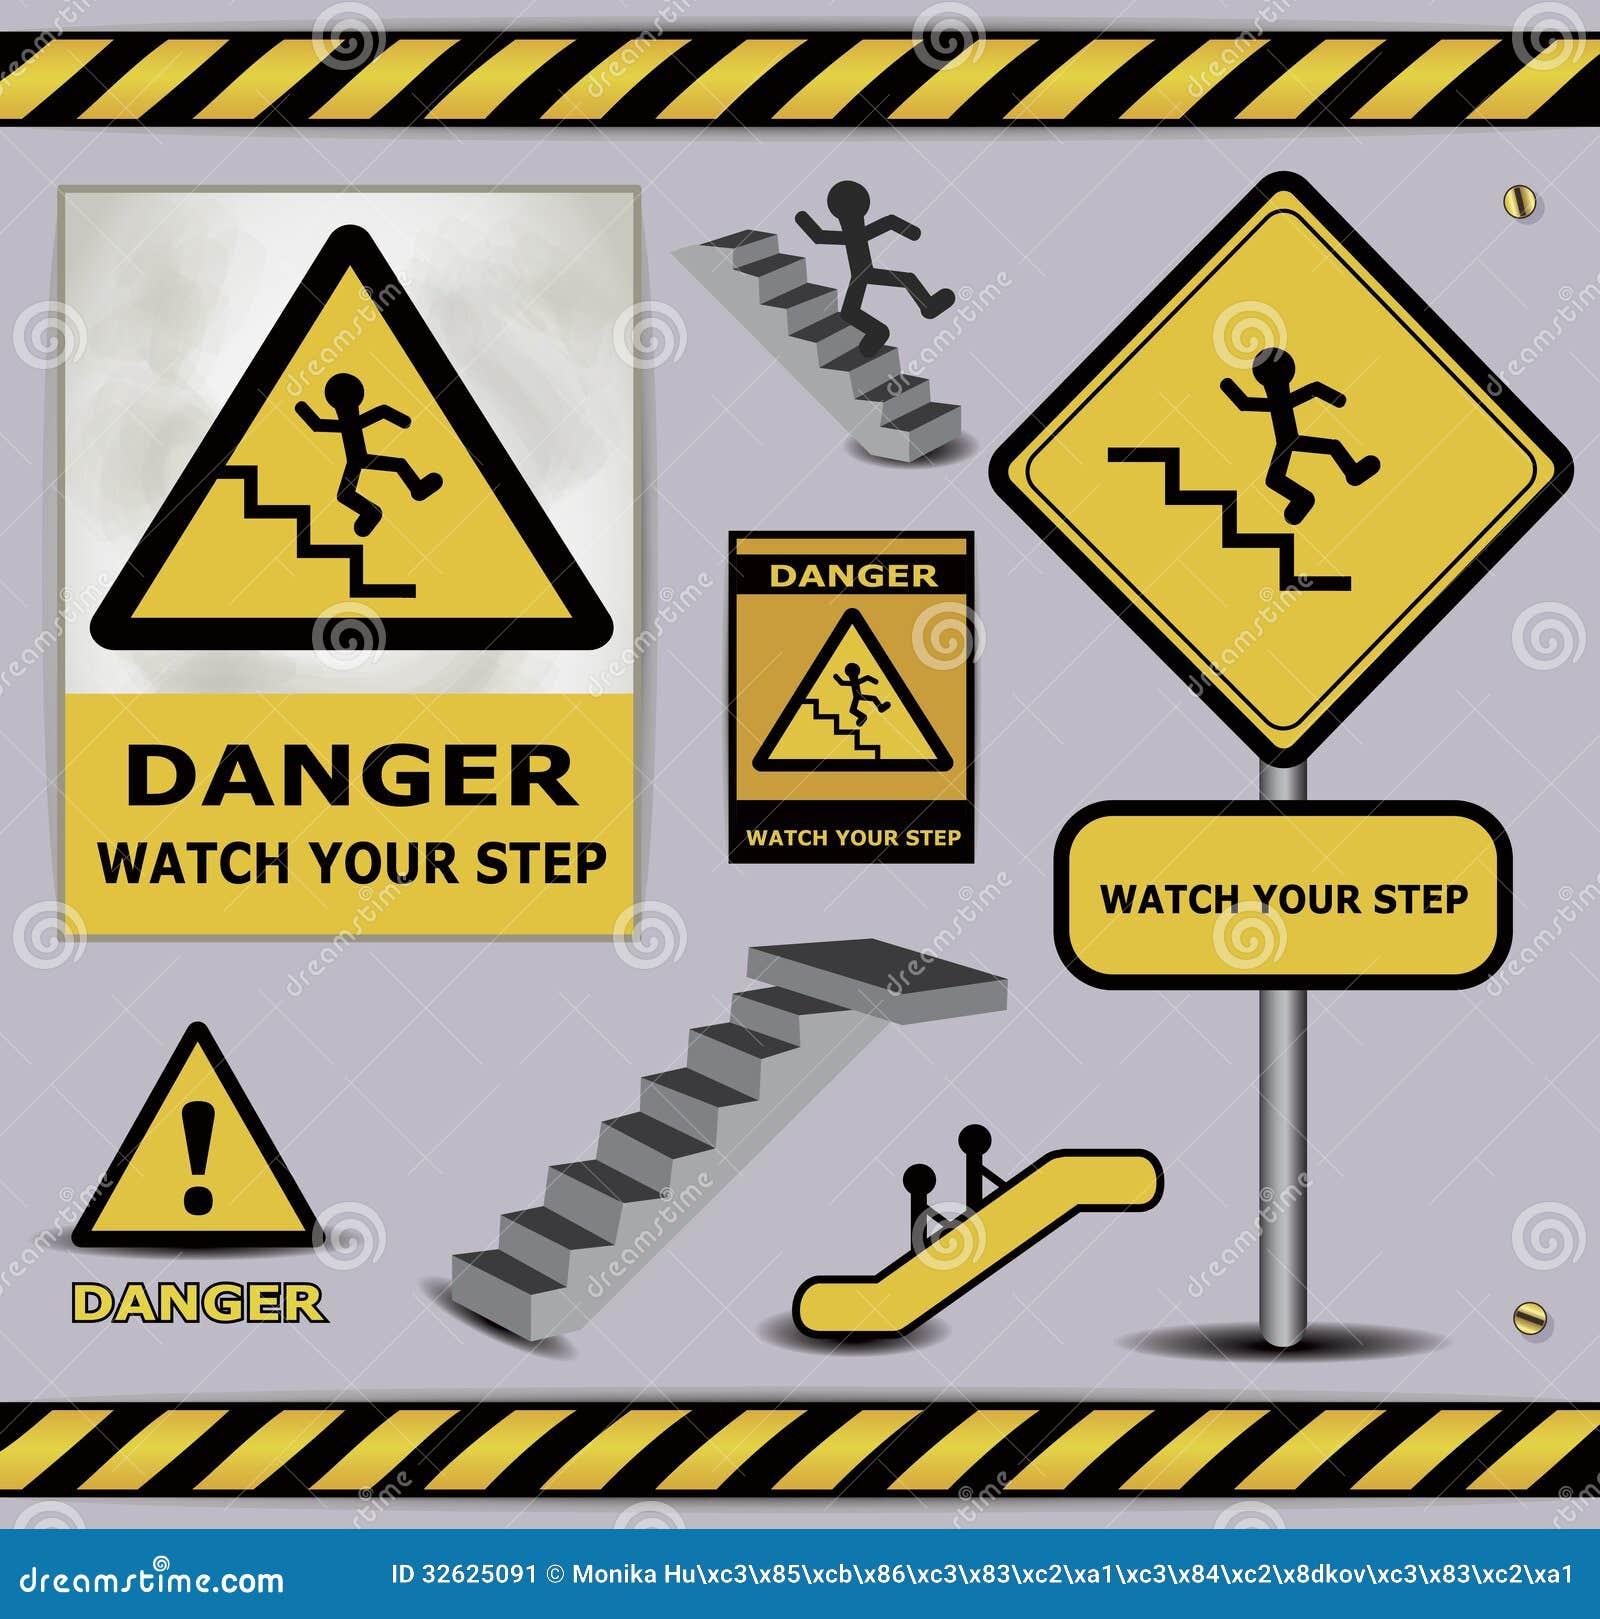 sign danger watch your step warning collection stock image shamrock vector image free shamrock vector image